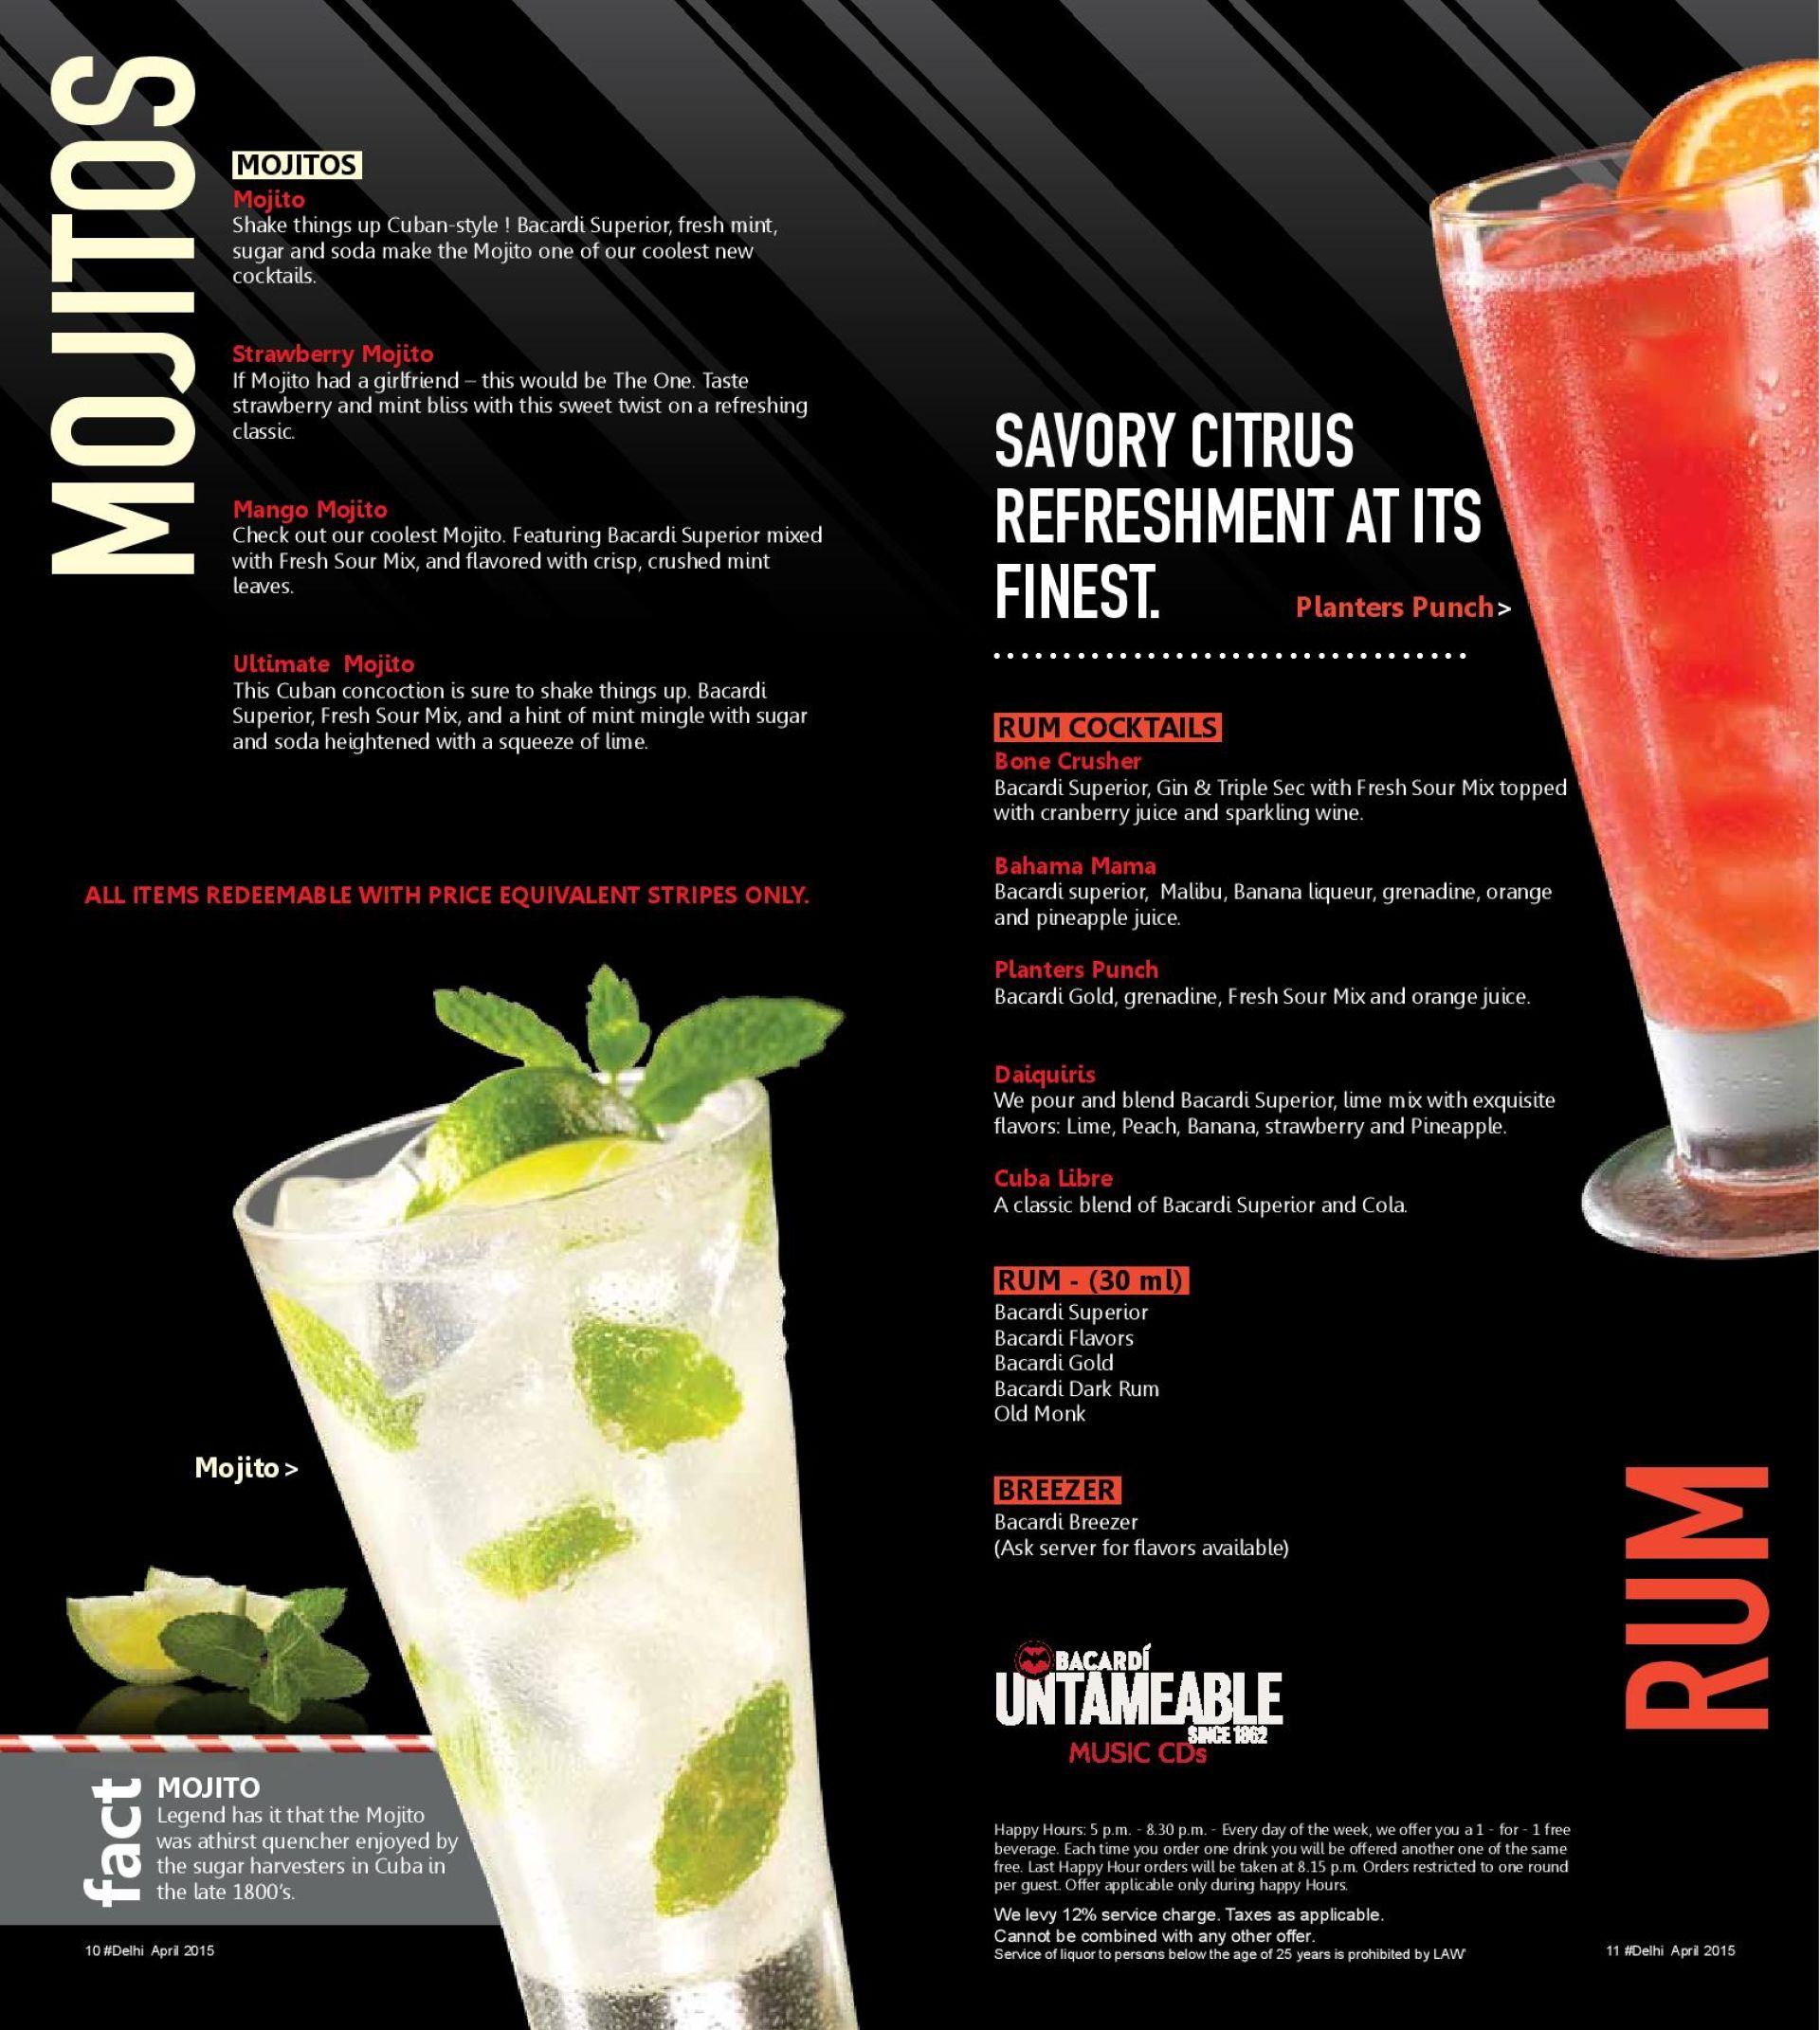 tgi friday's, mgf metropolitan mall, mg road, delhi ncr restaurants